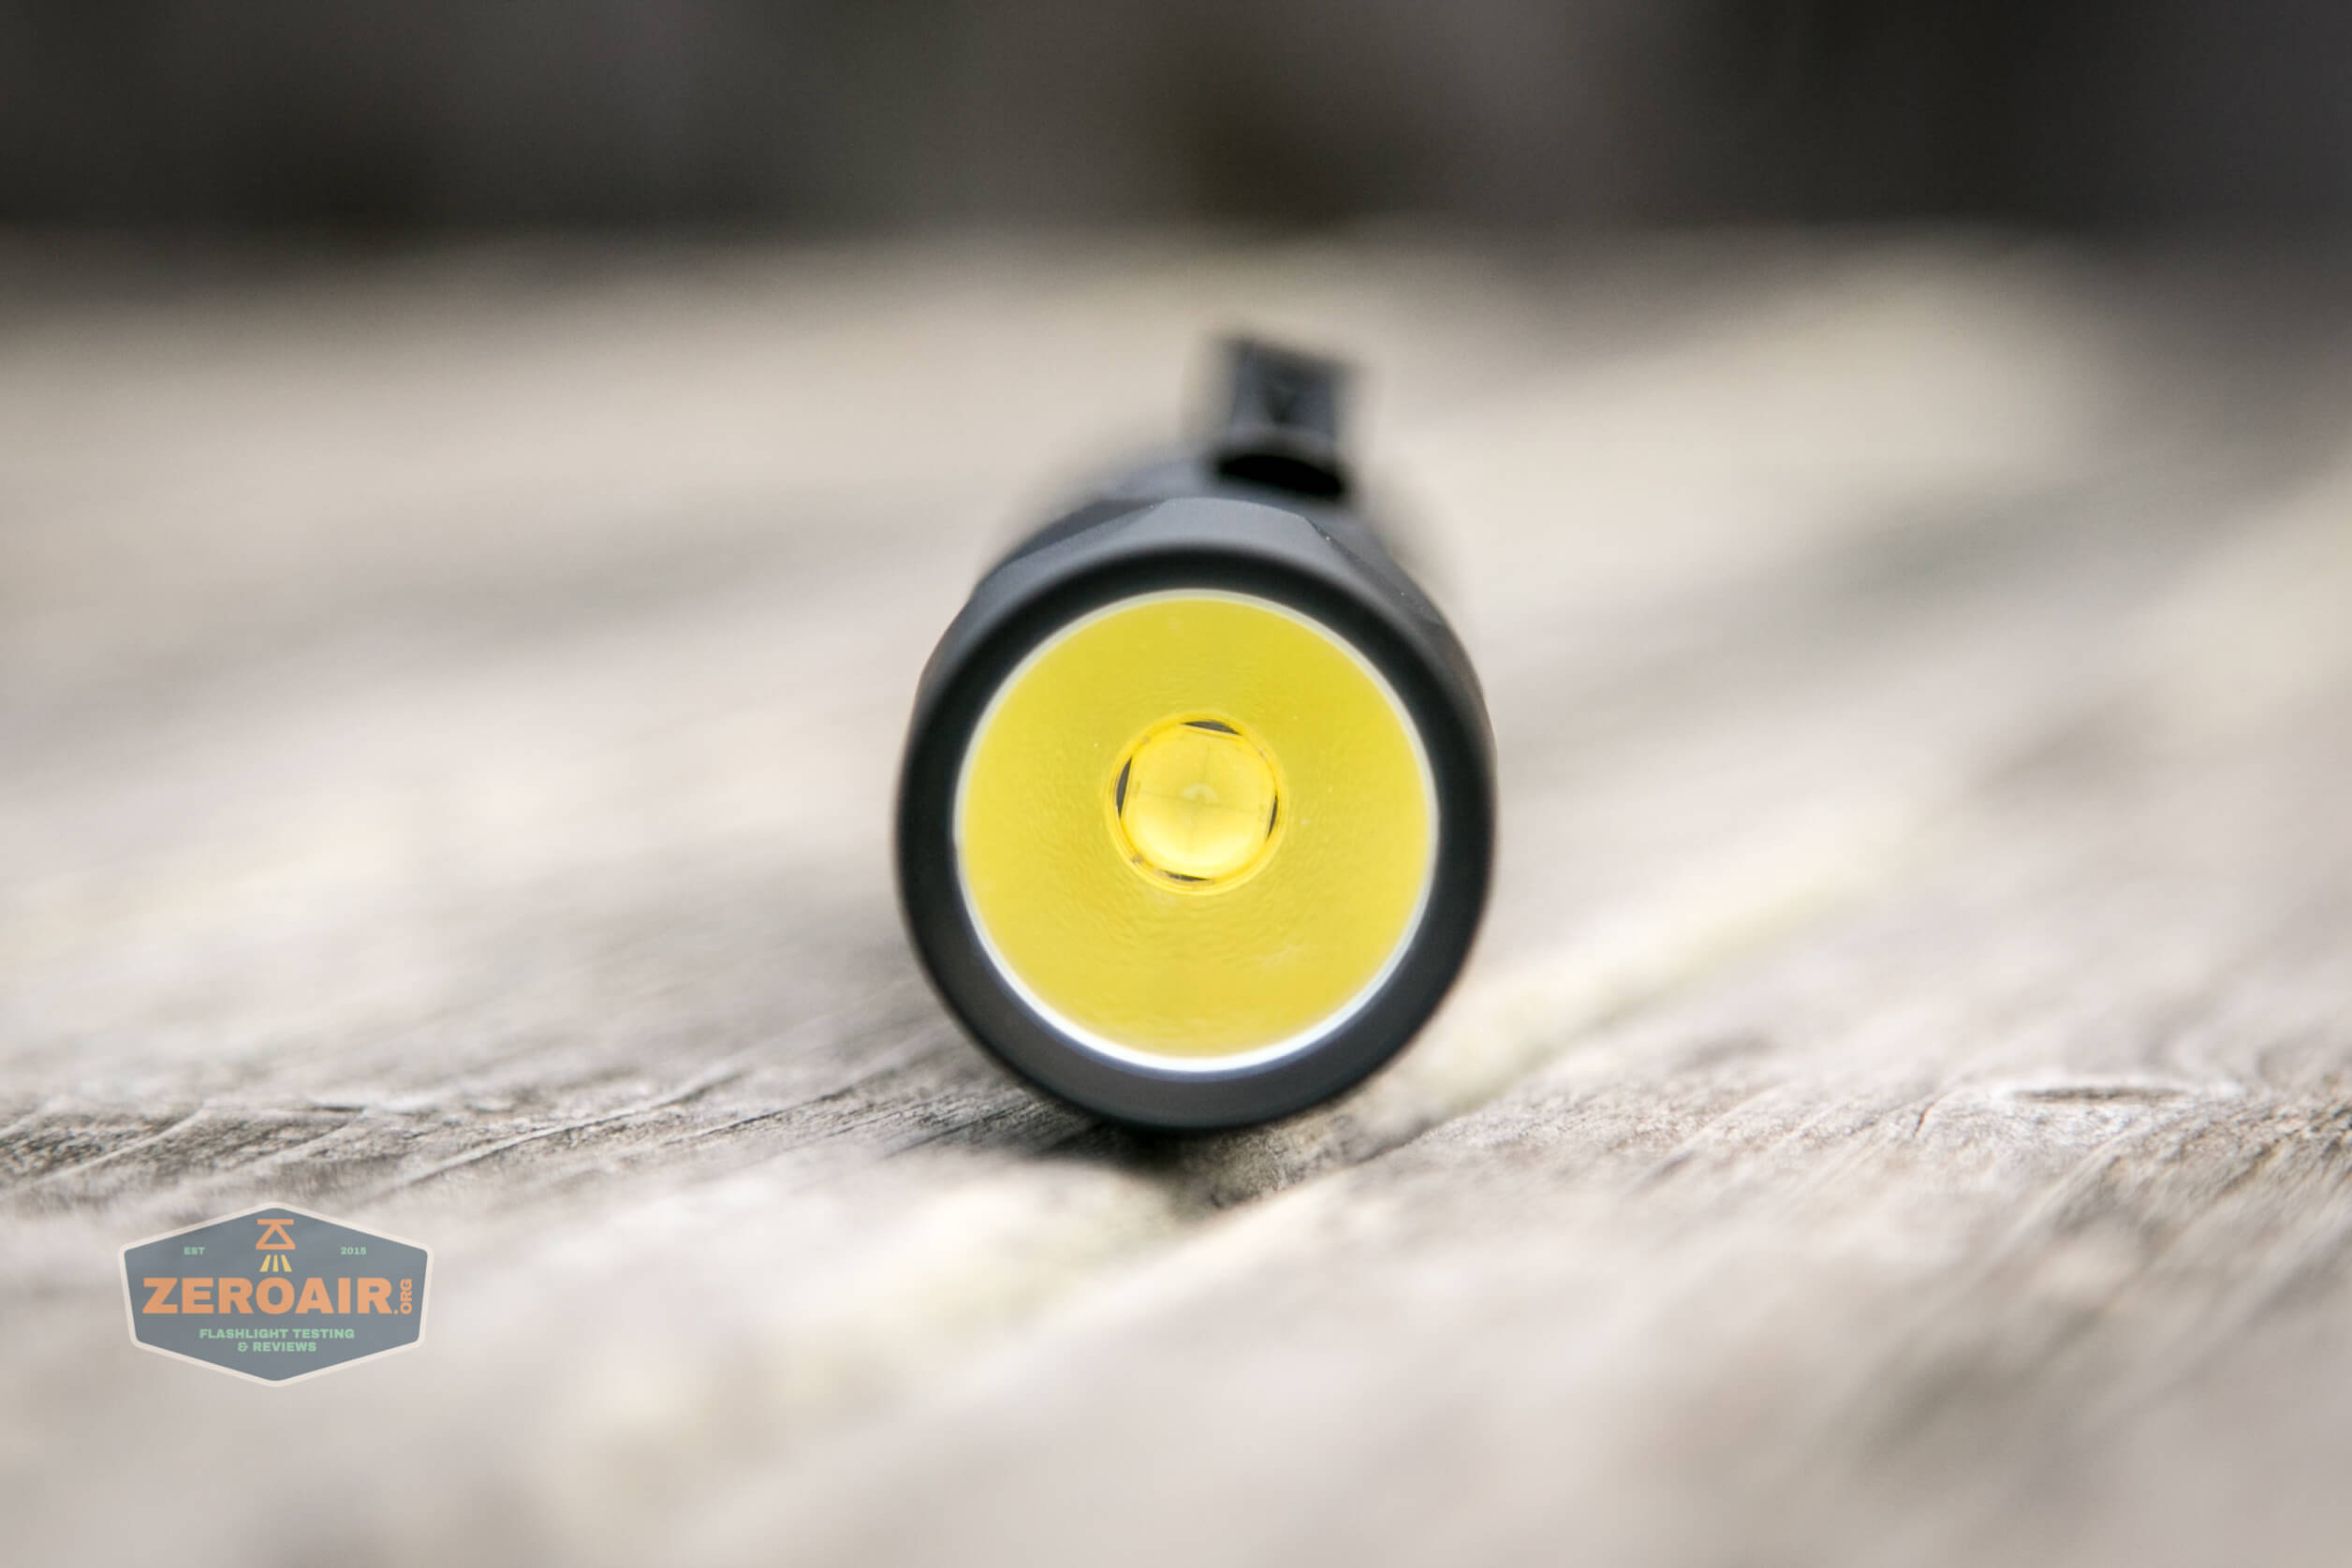 Cyansky P25 Flashlight emitter